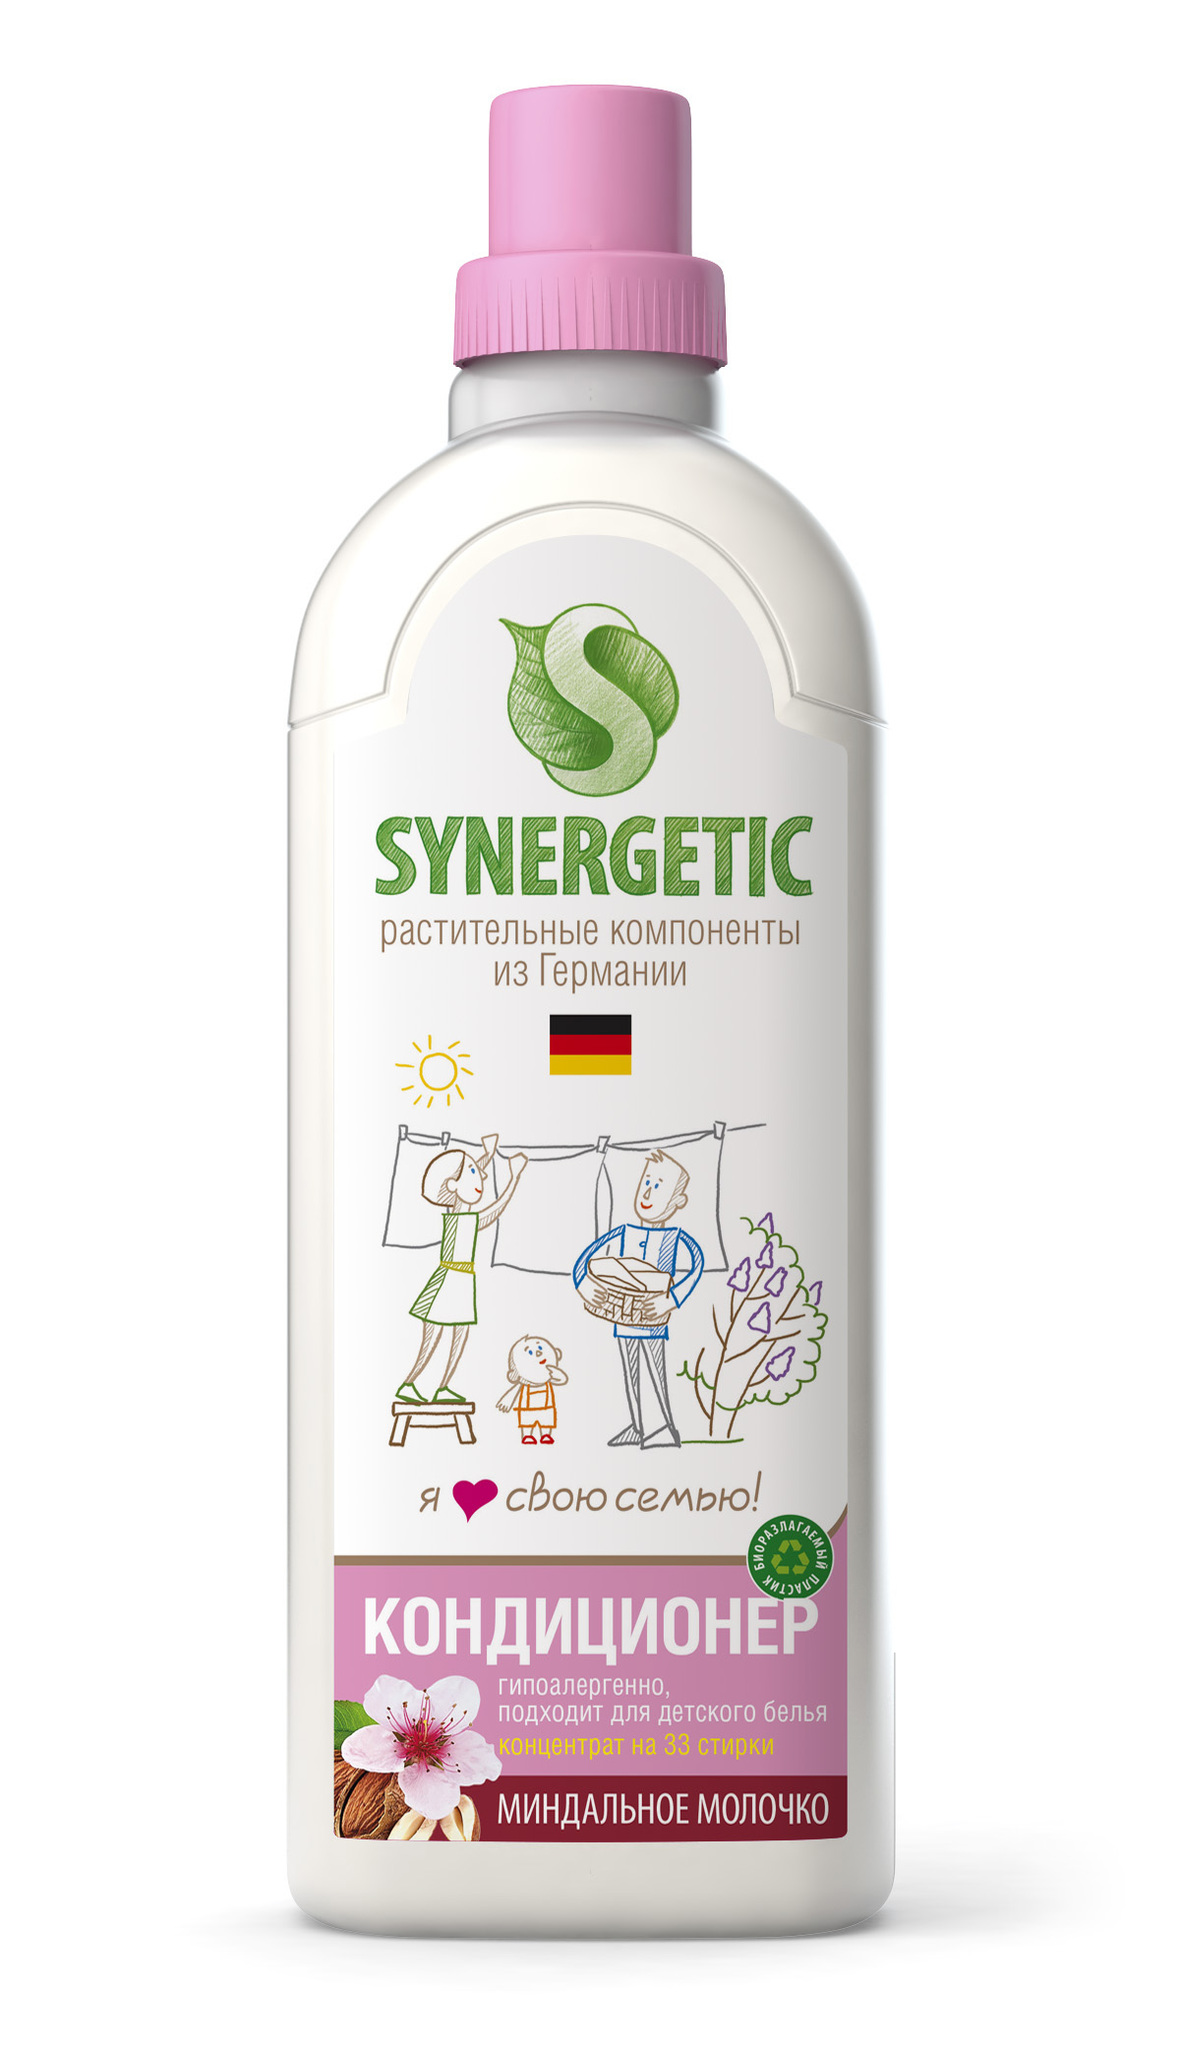 Кондиционер для белья Миндальное молочко (флакон 1 л) SYNERGETIC